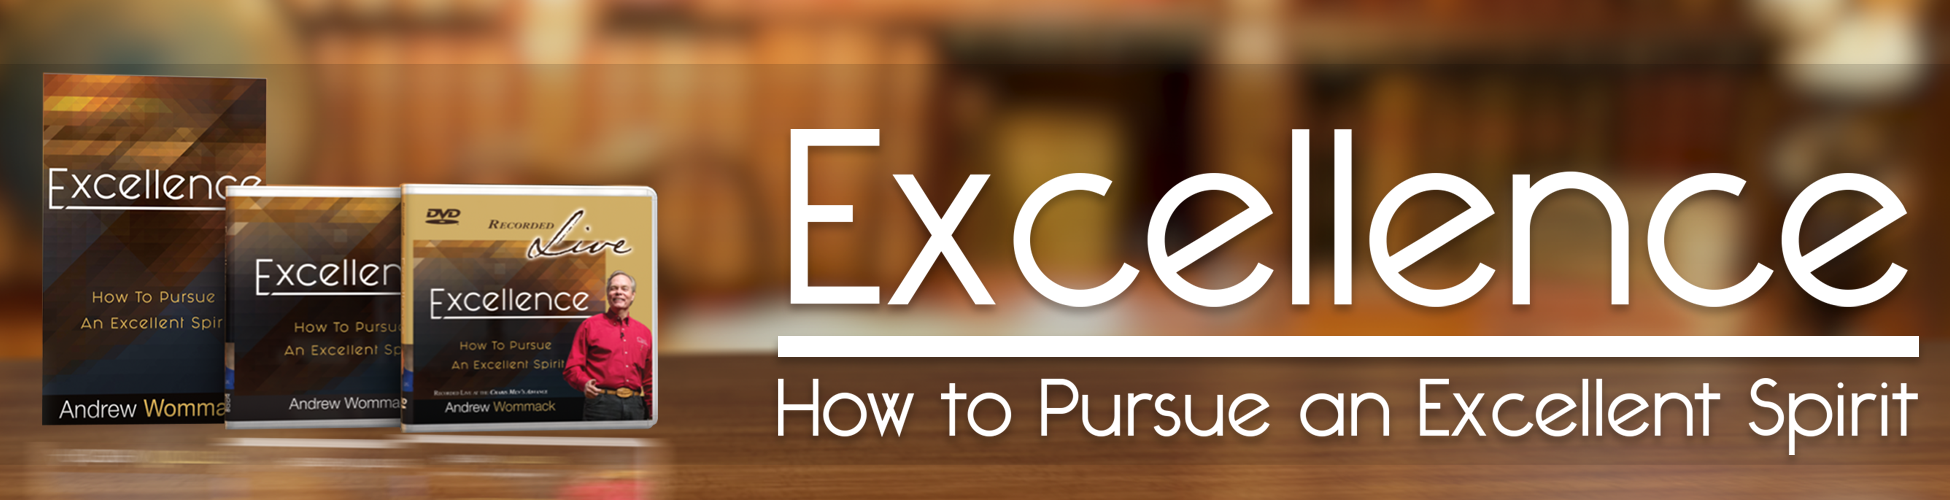 Excellence_website-banner-1